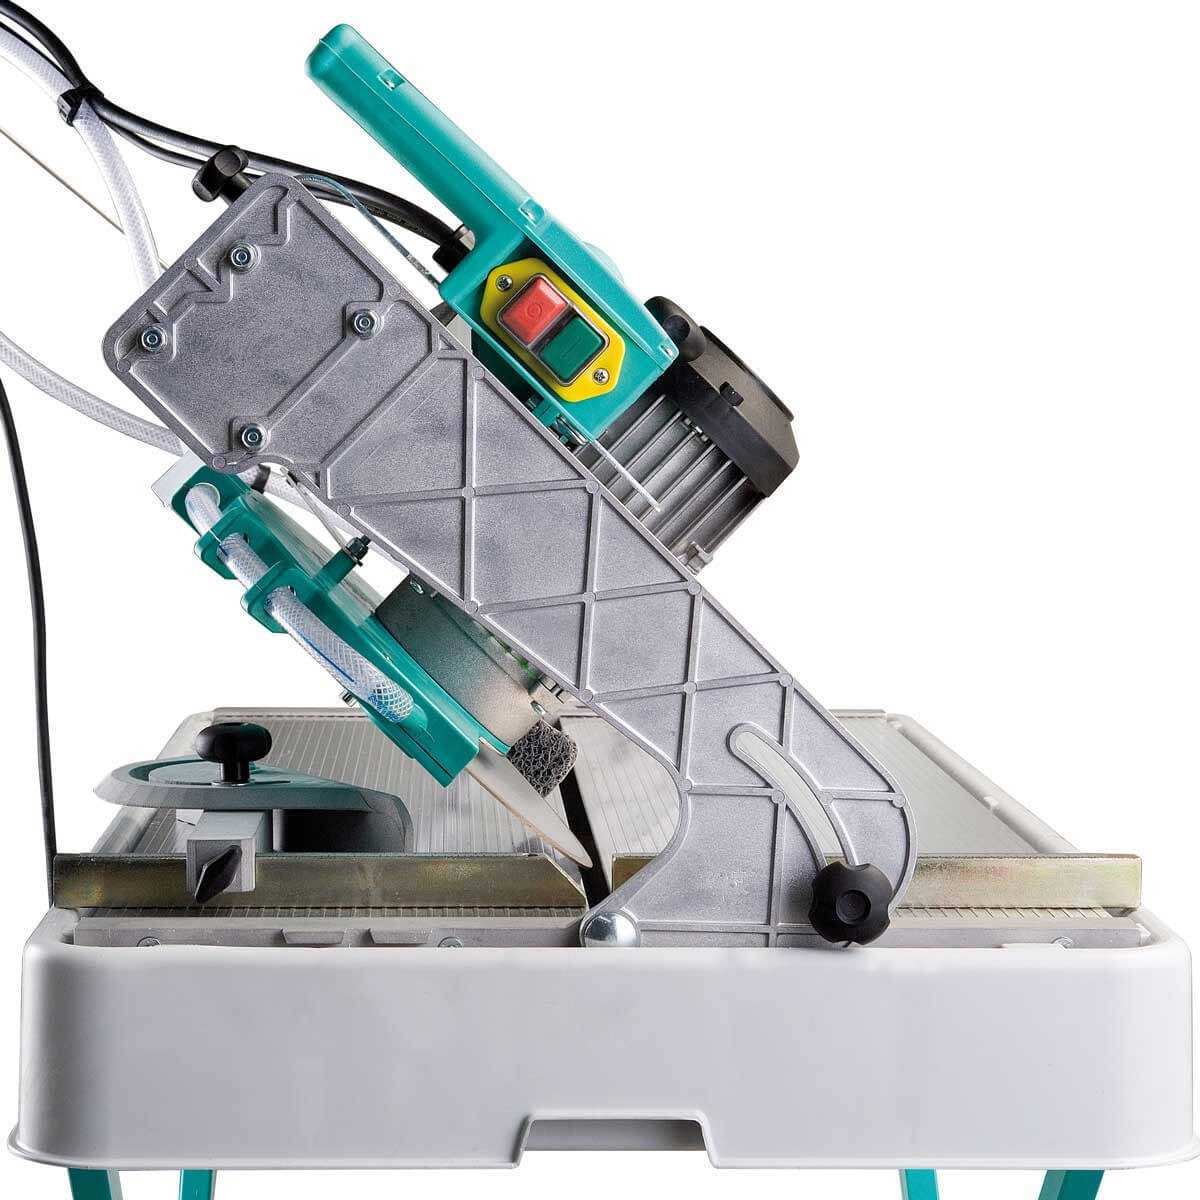 Imer 250/1500VA Lite 45 degree cutting capability